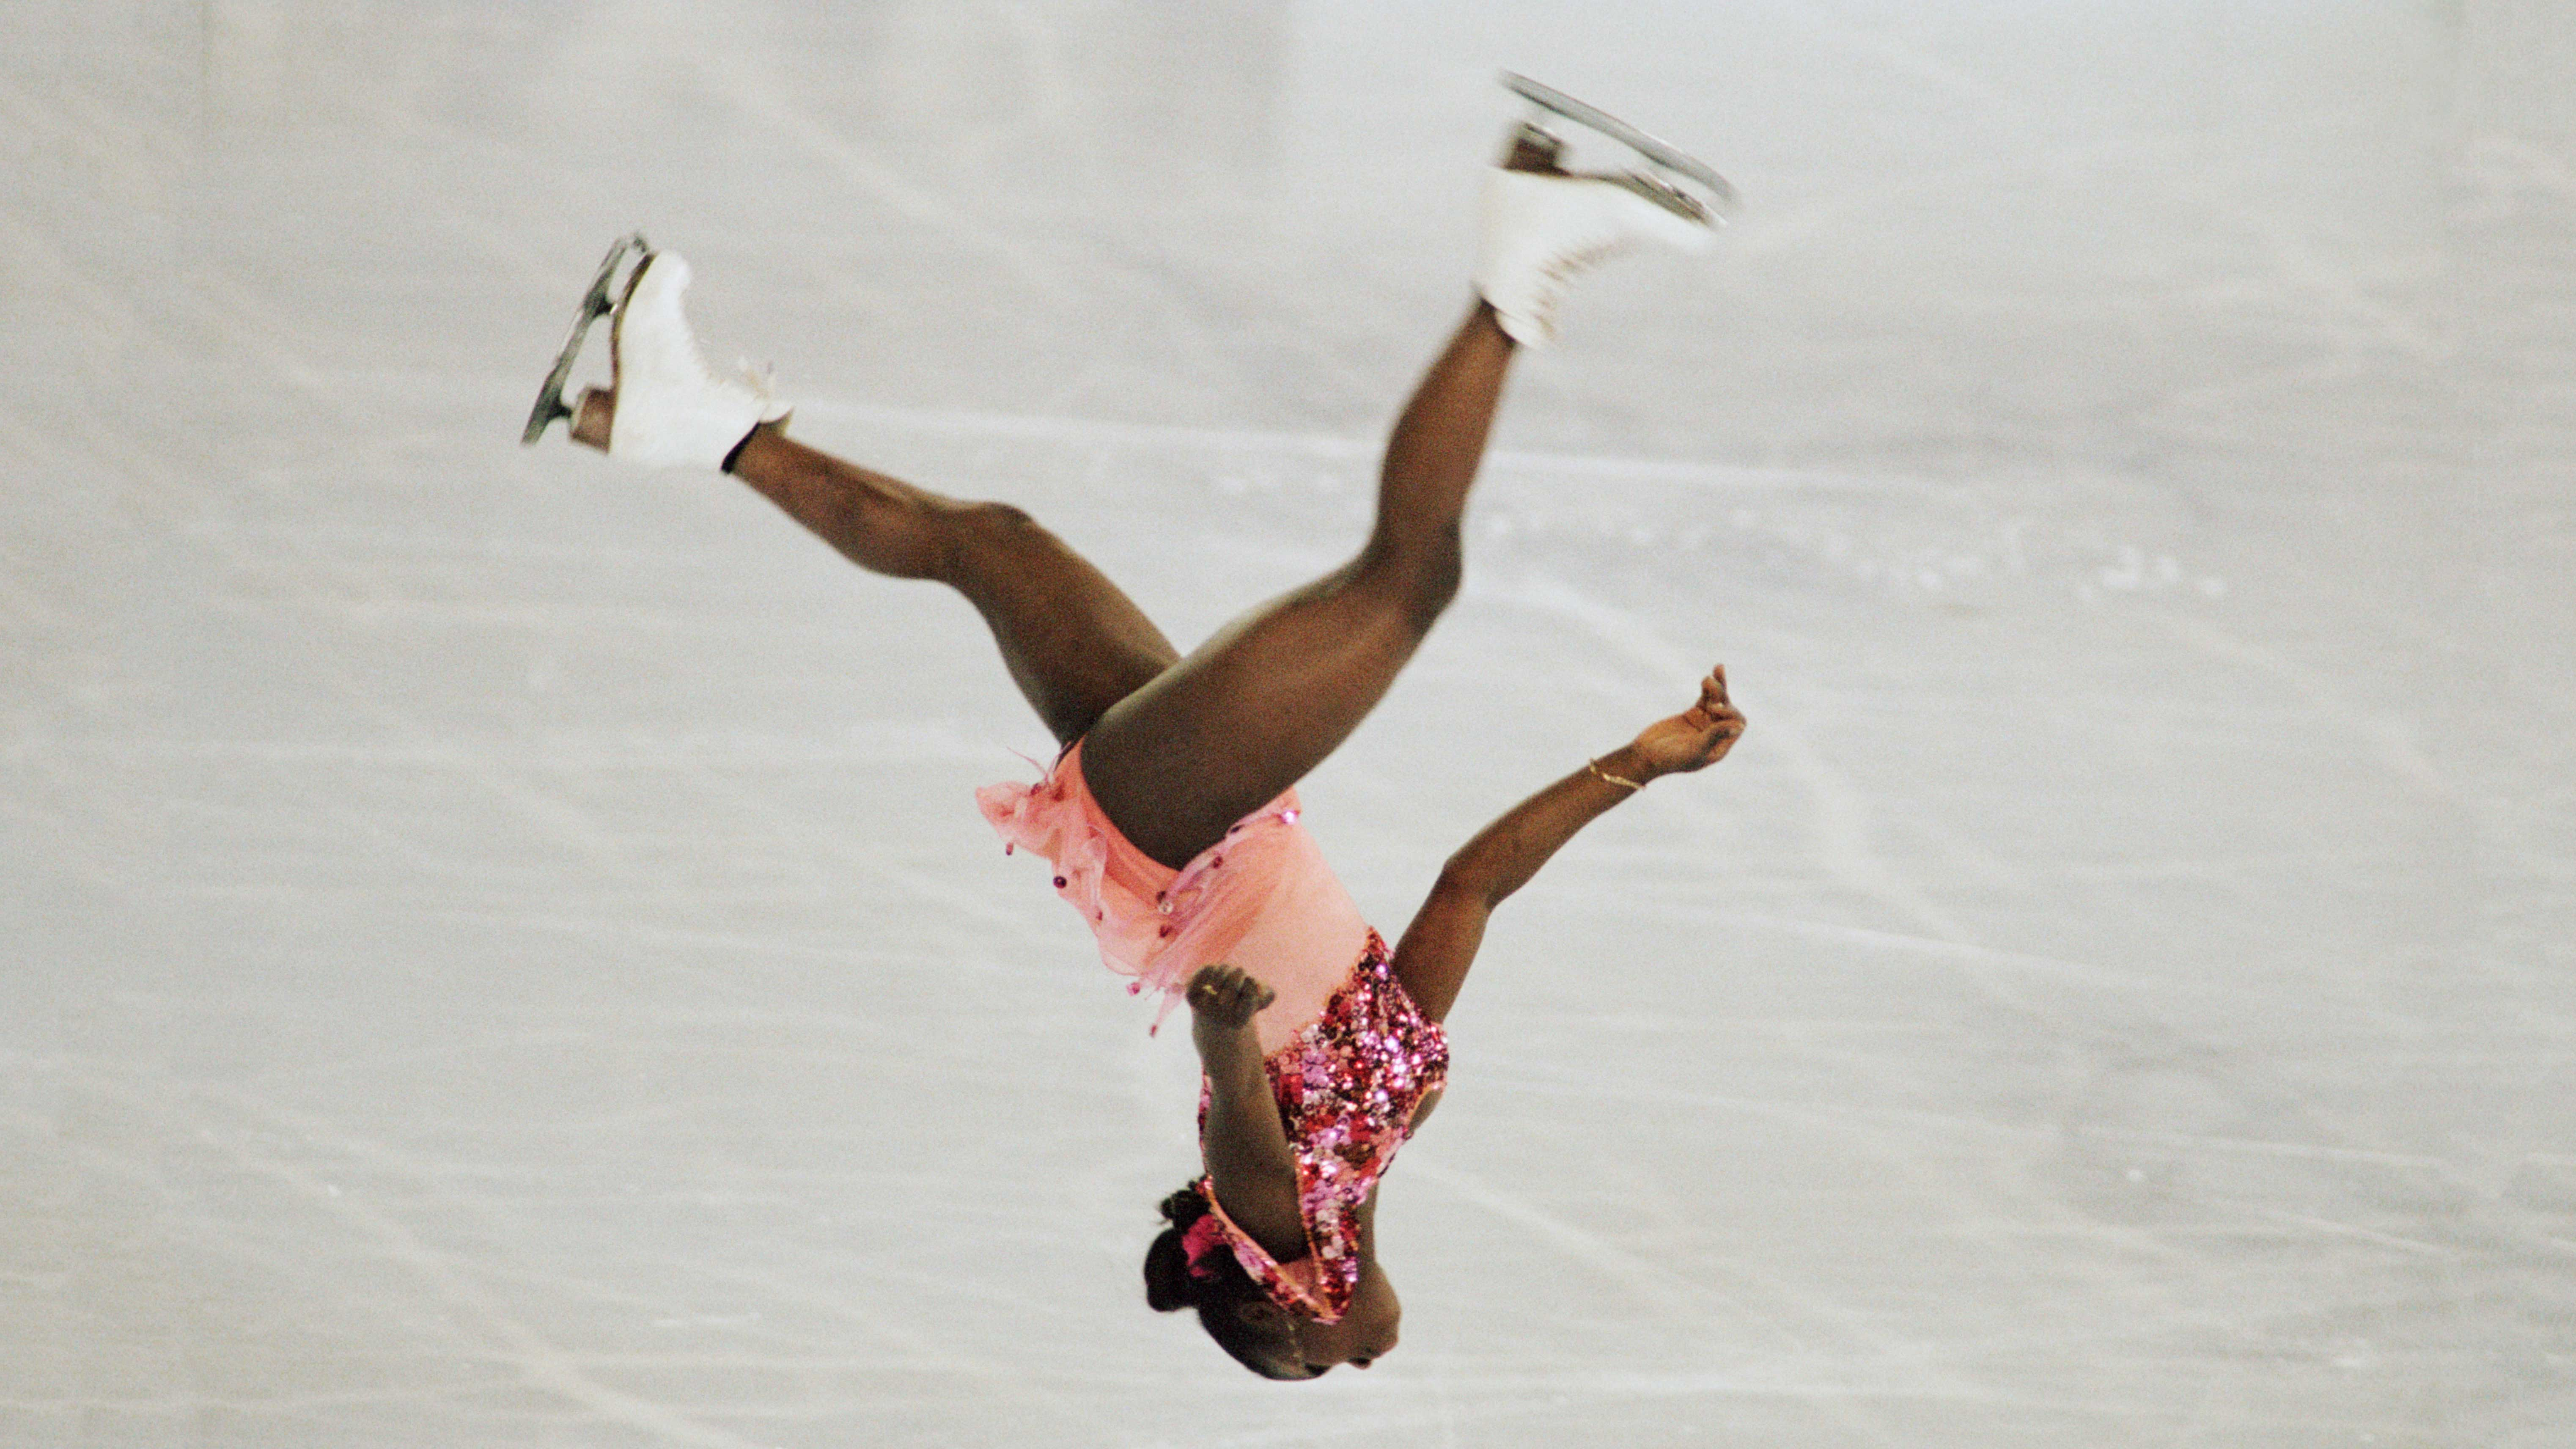 Figure Skating – Surya Bonaly